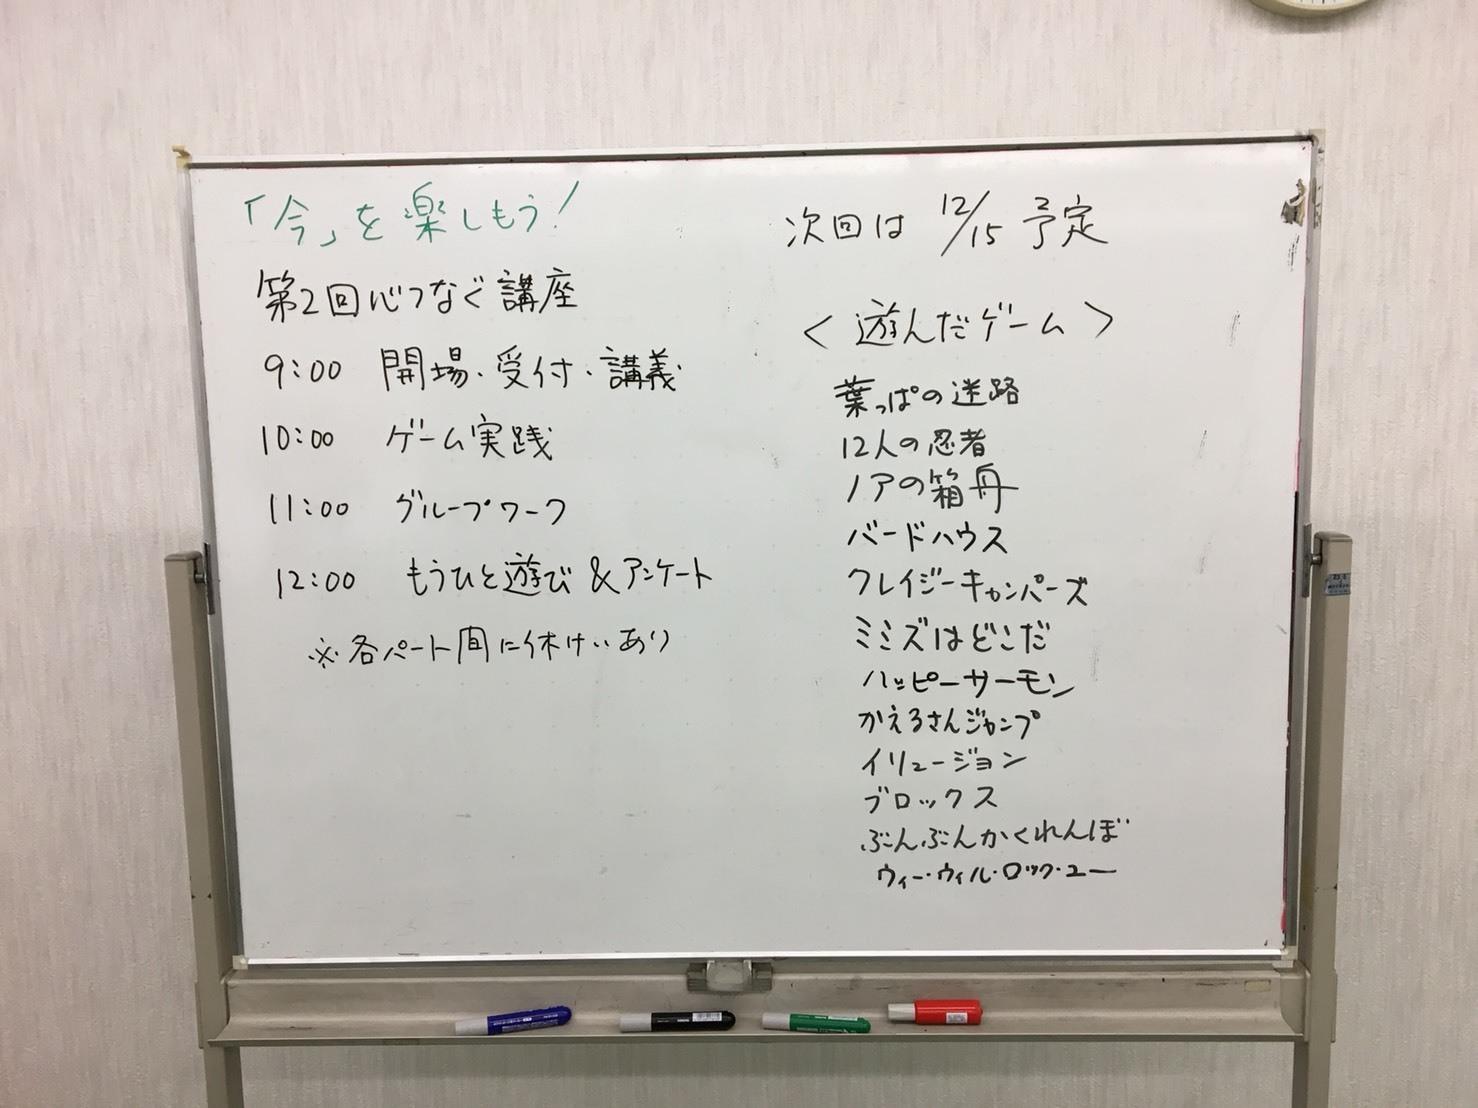 S__12738579.jpg